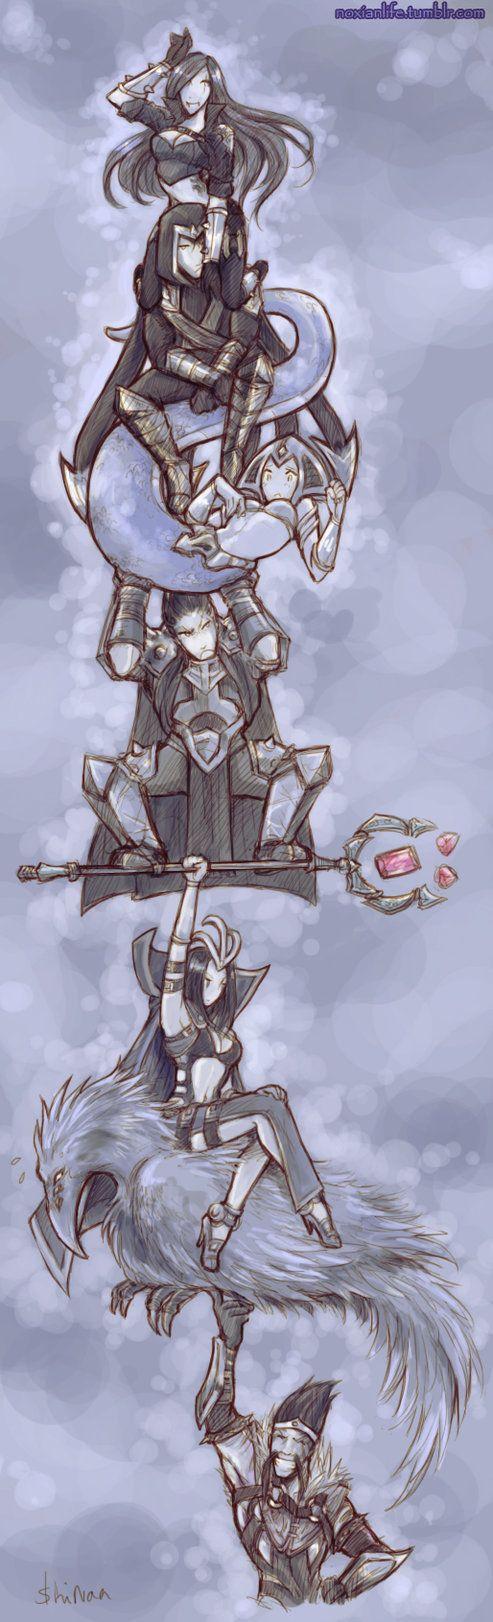 [Noxian Life] Noxian Tower by *ShiNaa on deviantART